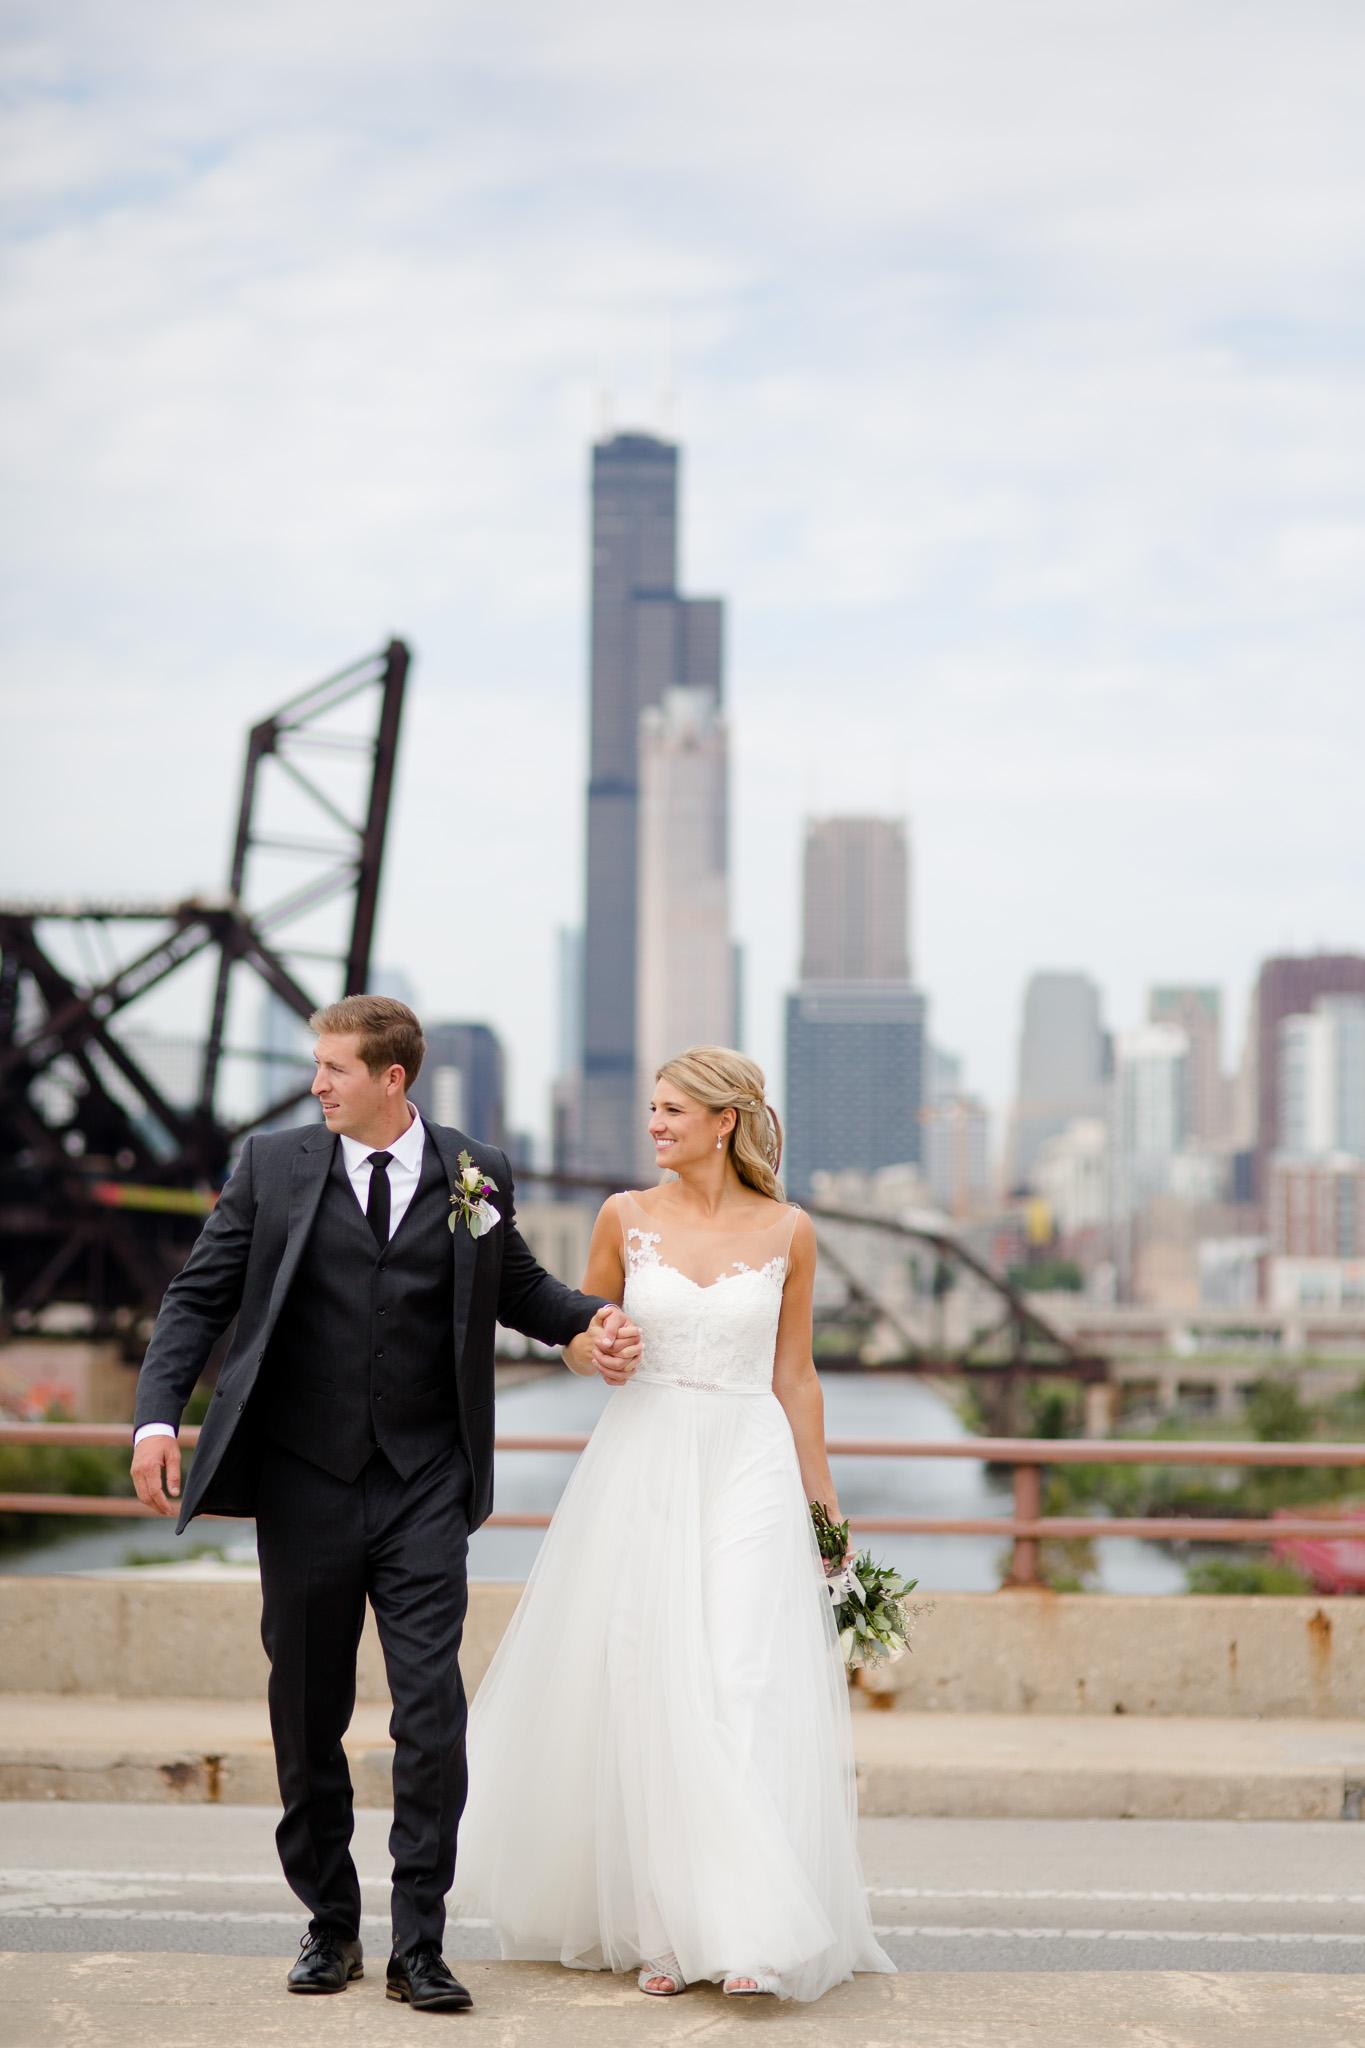 bridgeport-art-center-wedding-photos-17.jpg